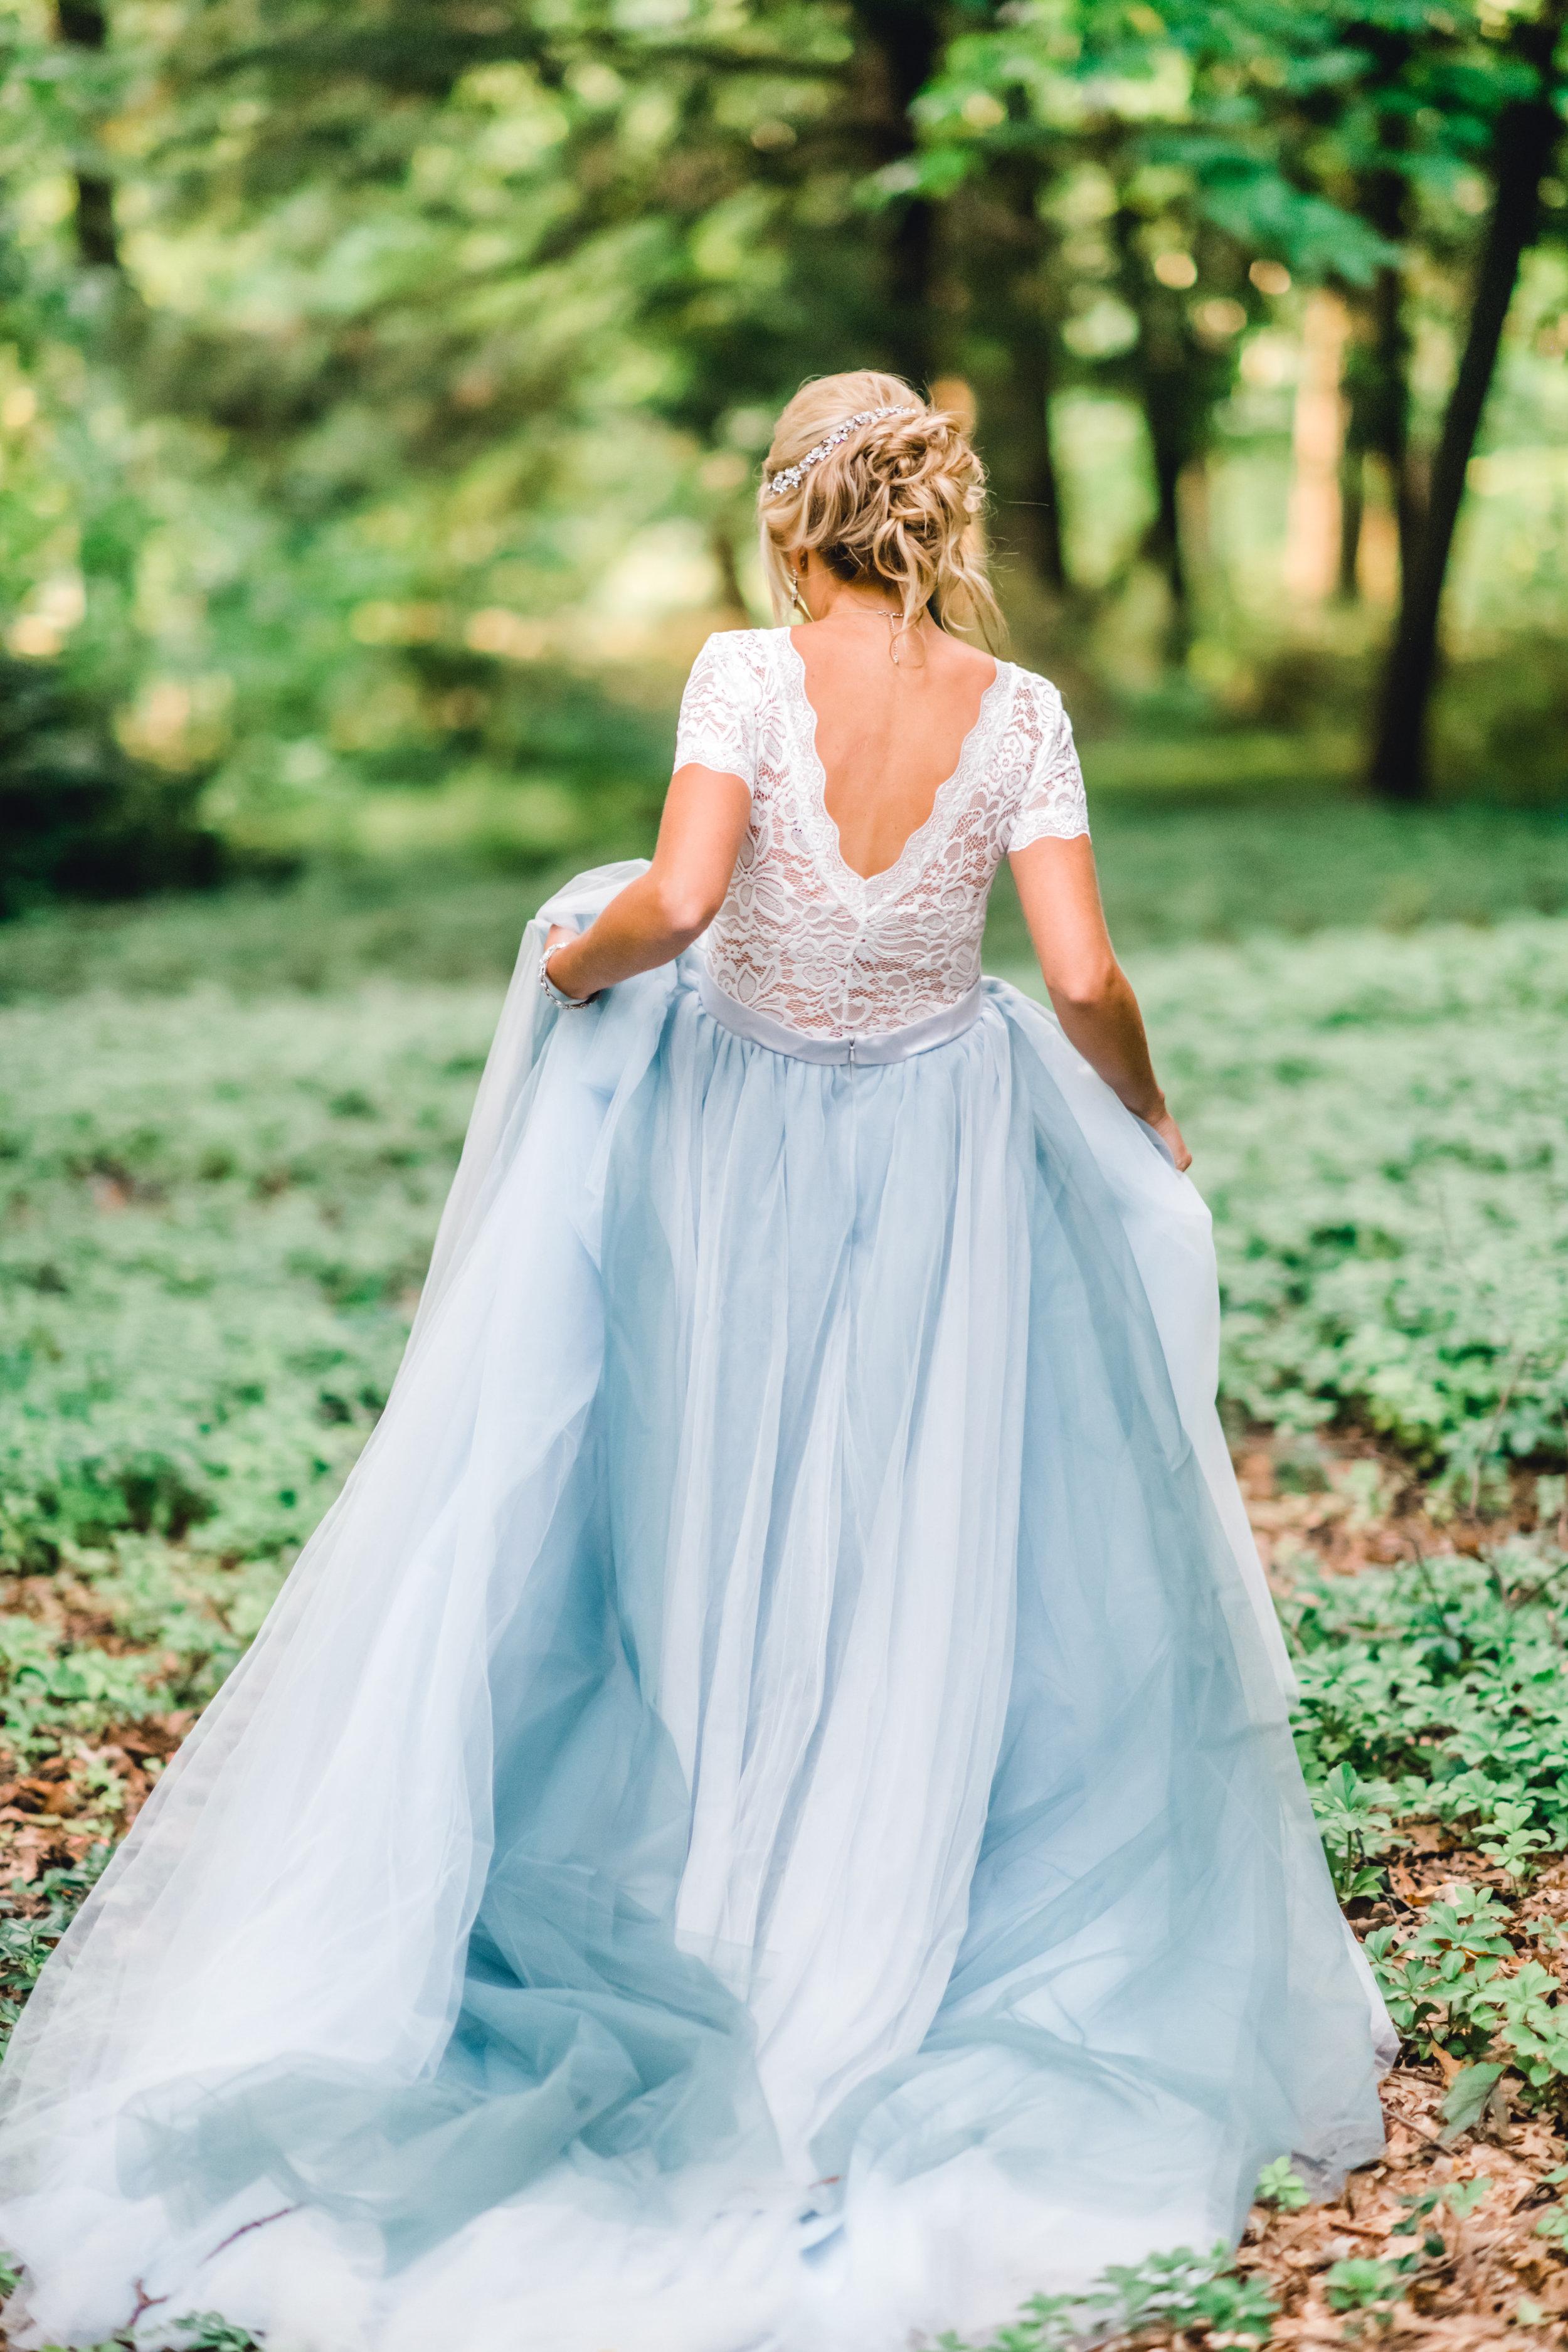 Jessica-Garda-Events-Pittsburgh-Wedding-Planner-Mansion-Butler-Blue-Dress (75).jpg